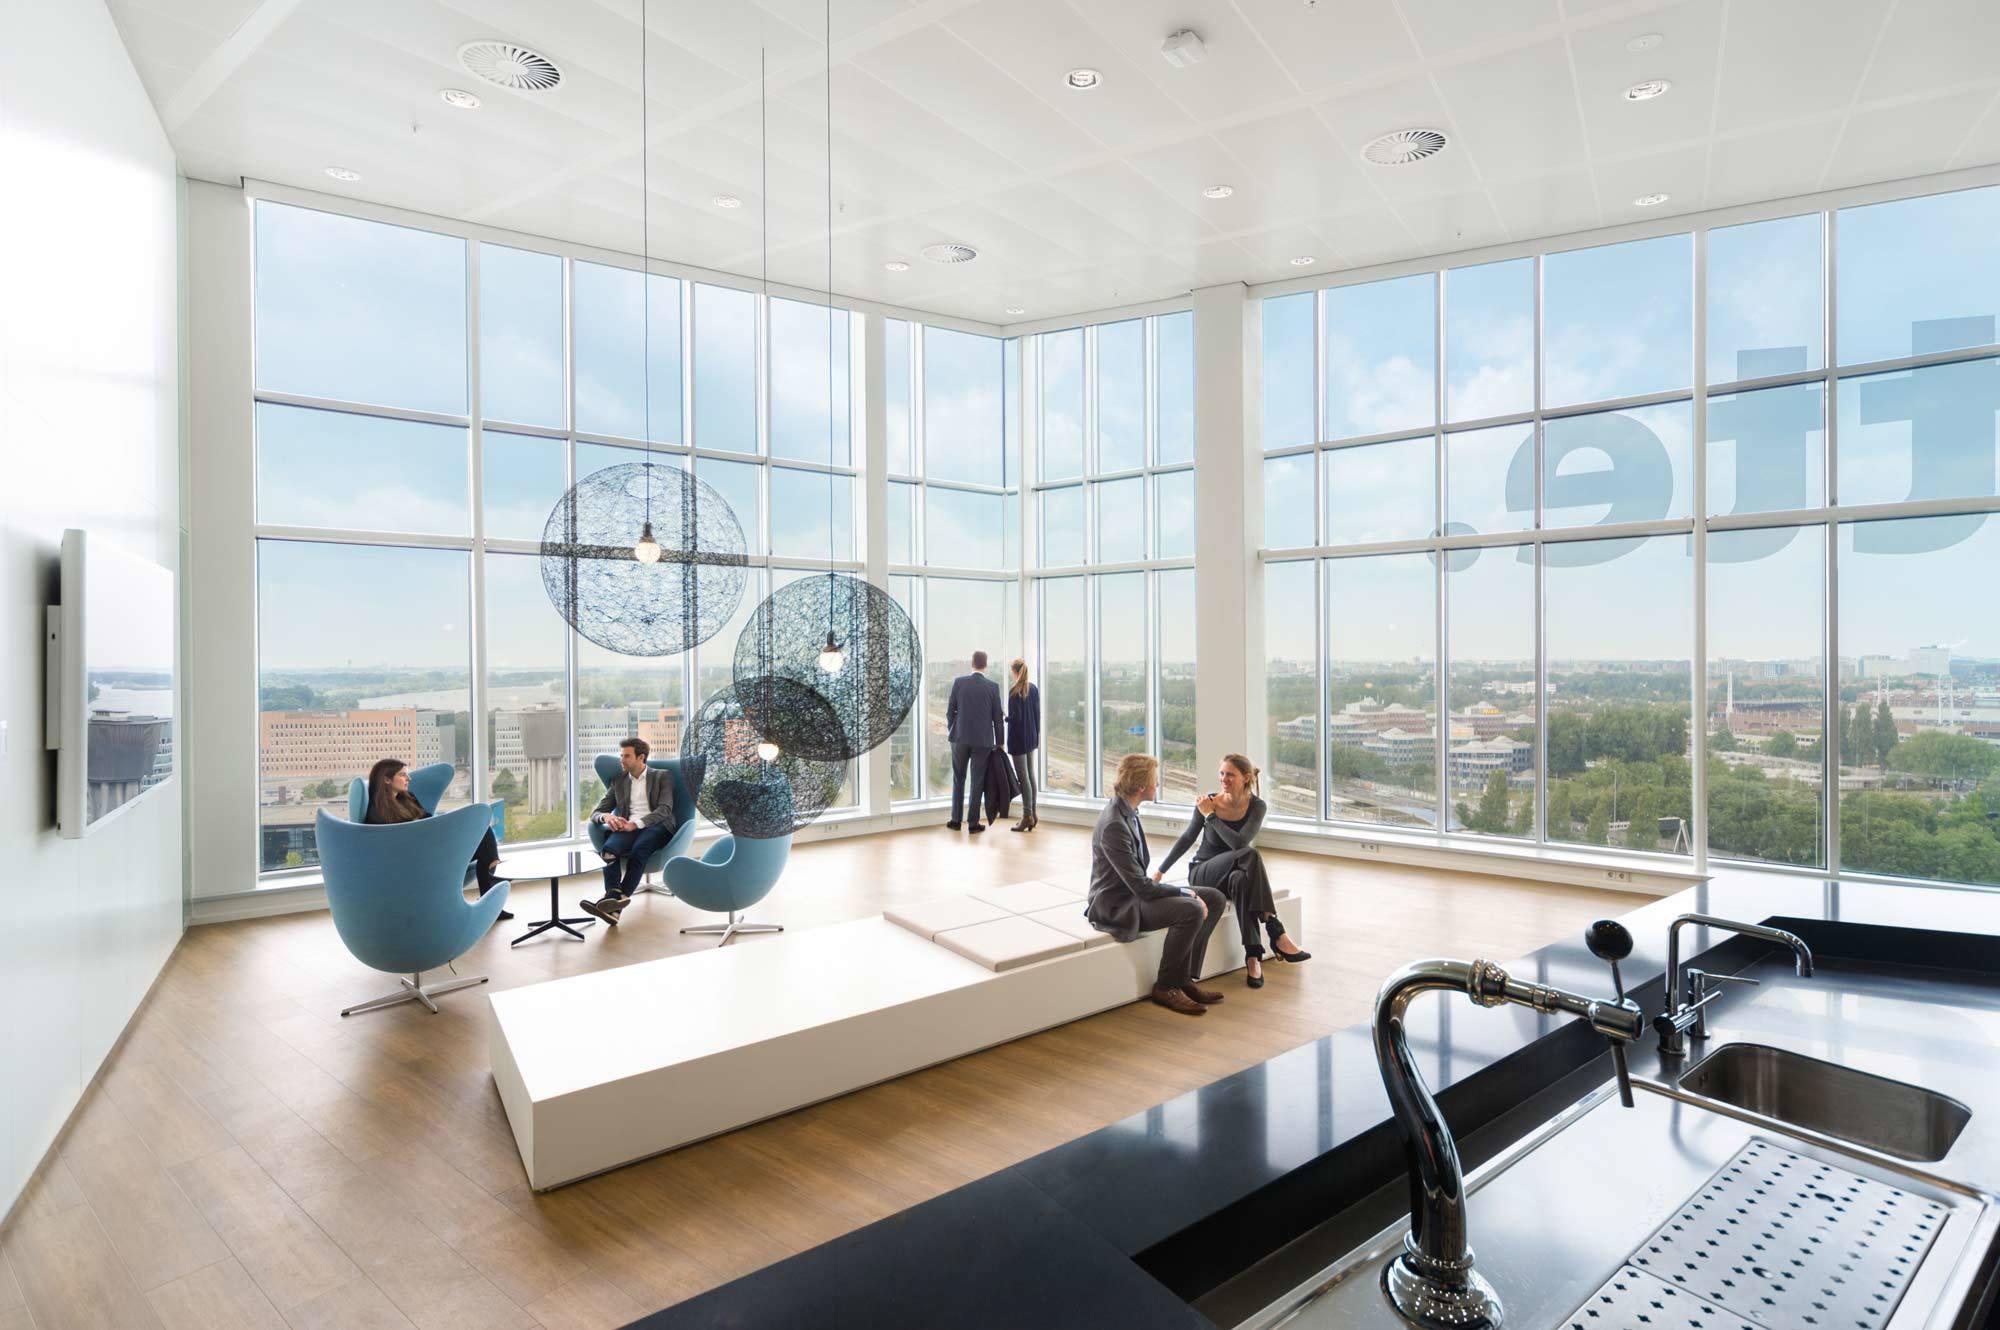 The Edge, PLP Architecture, Interior Design: Fokkema & Partners, Amsterdam, 2015, Foto: Bram Vreugdenhil